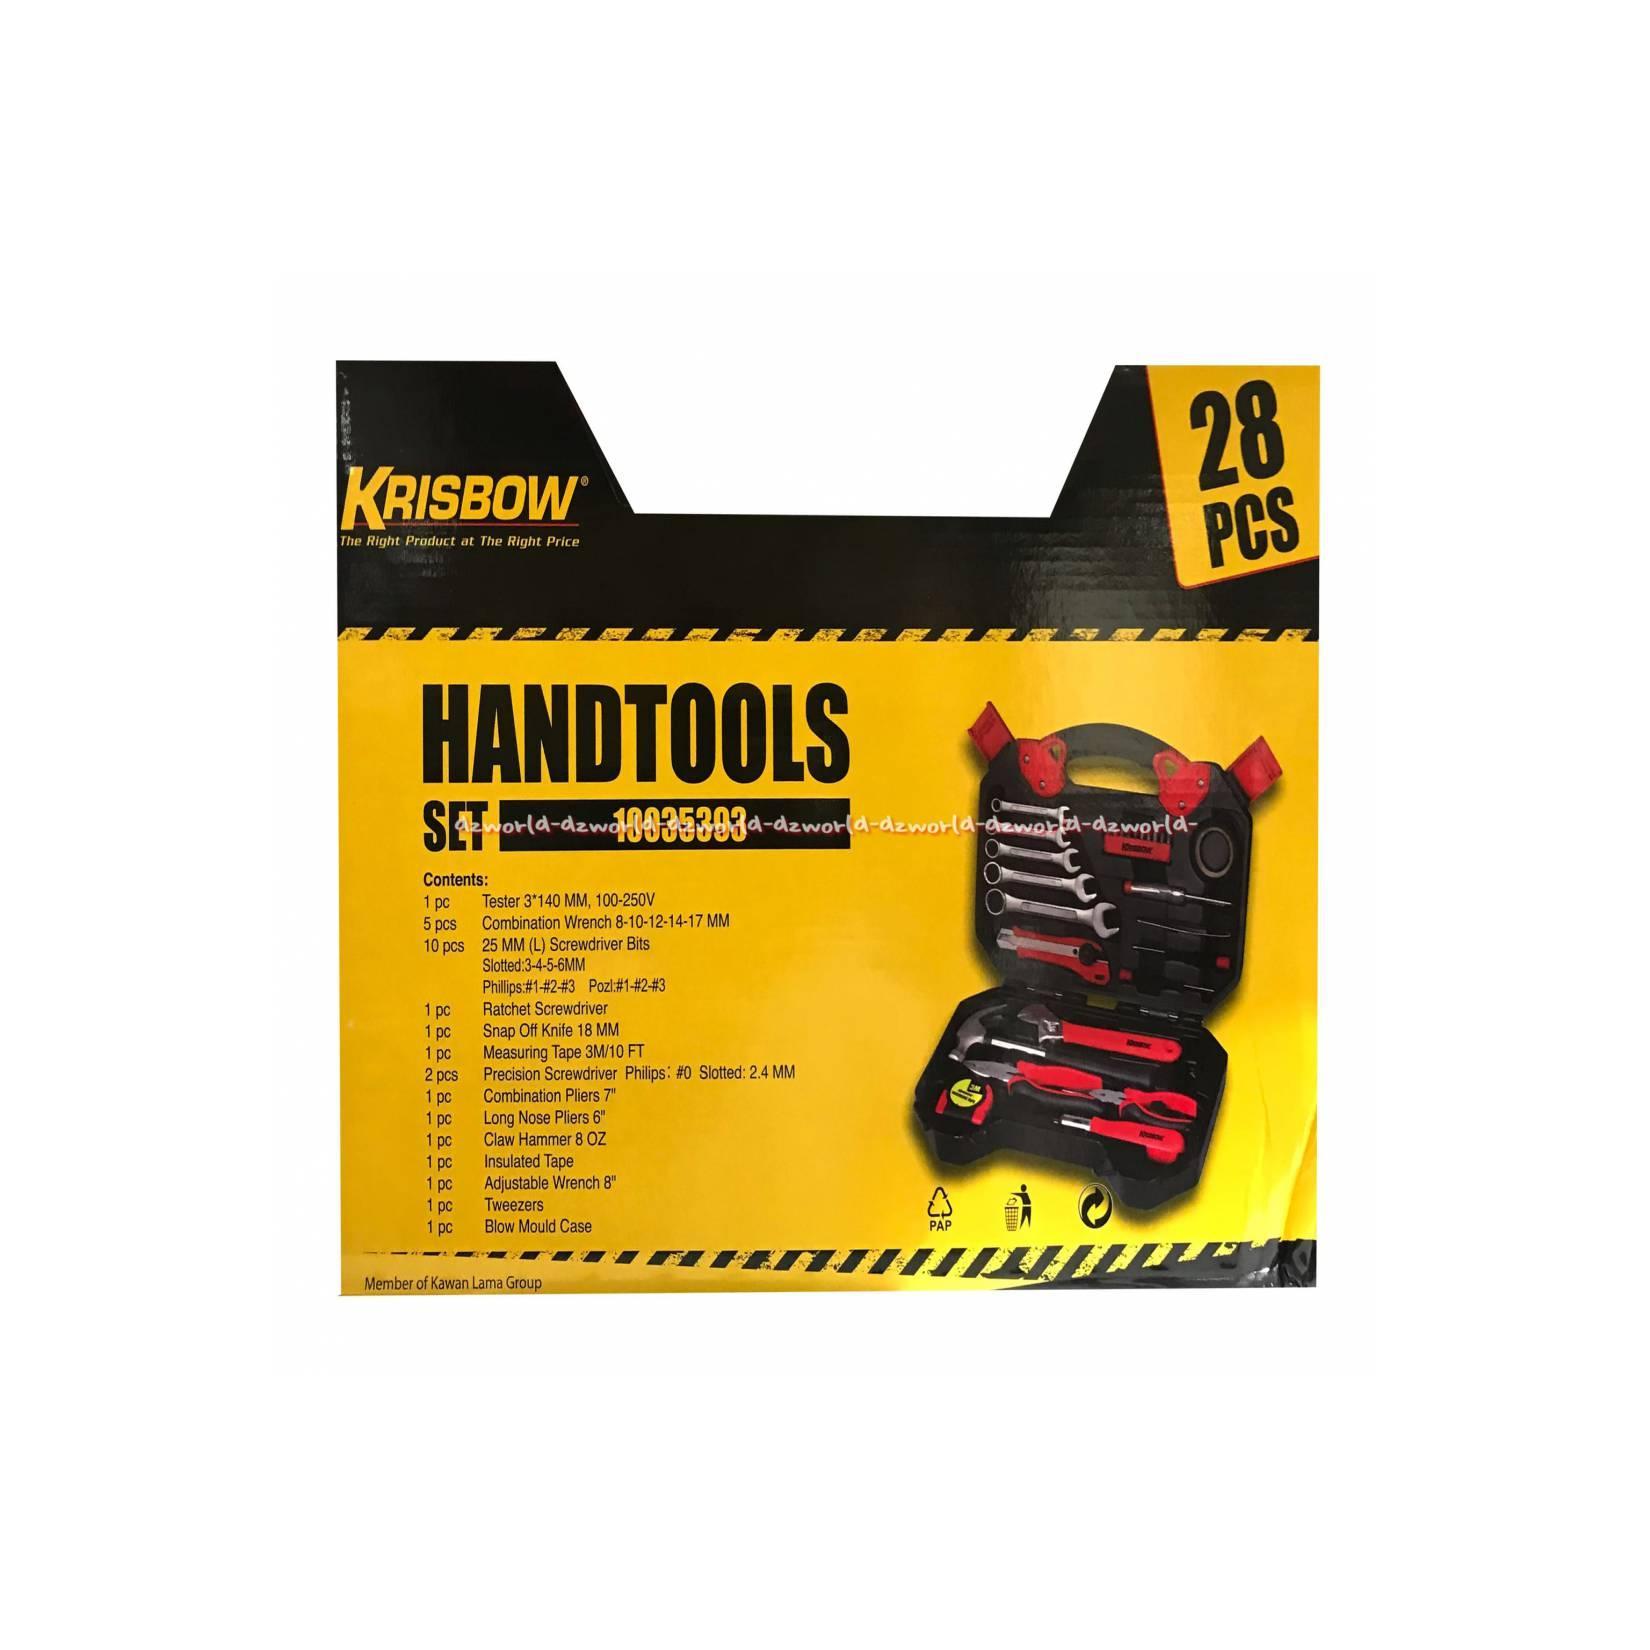 Krisbow Handtools Set 28Pcs Peralatan Mekanik Set Alat Obeng Set